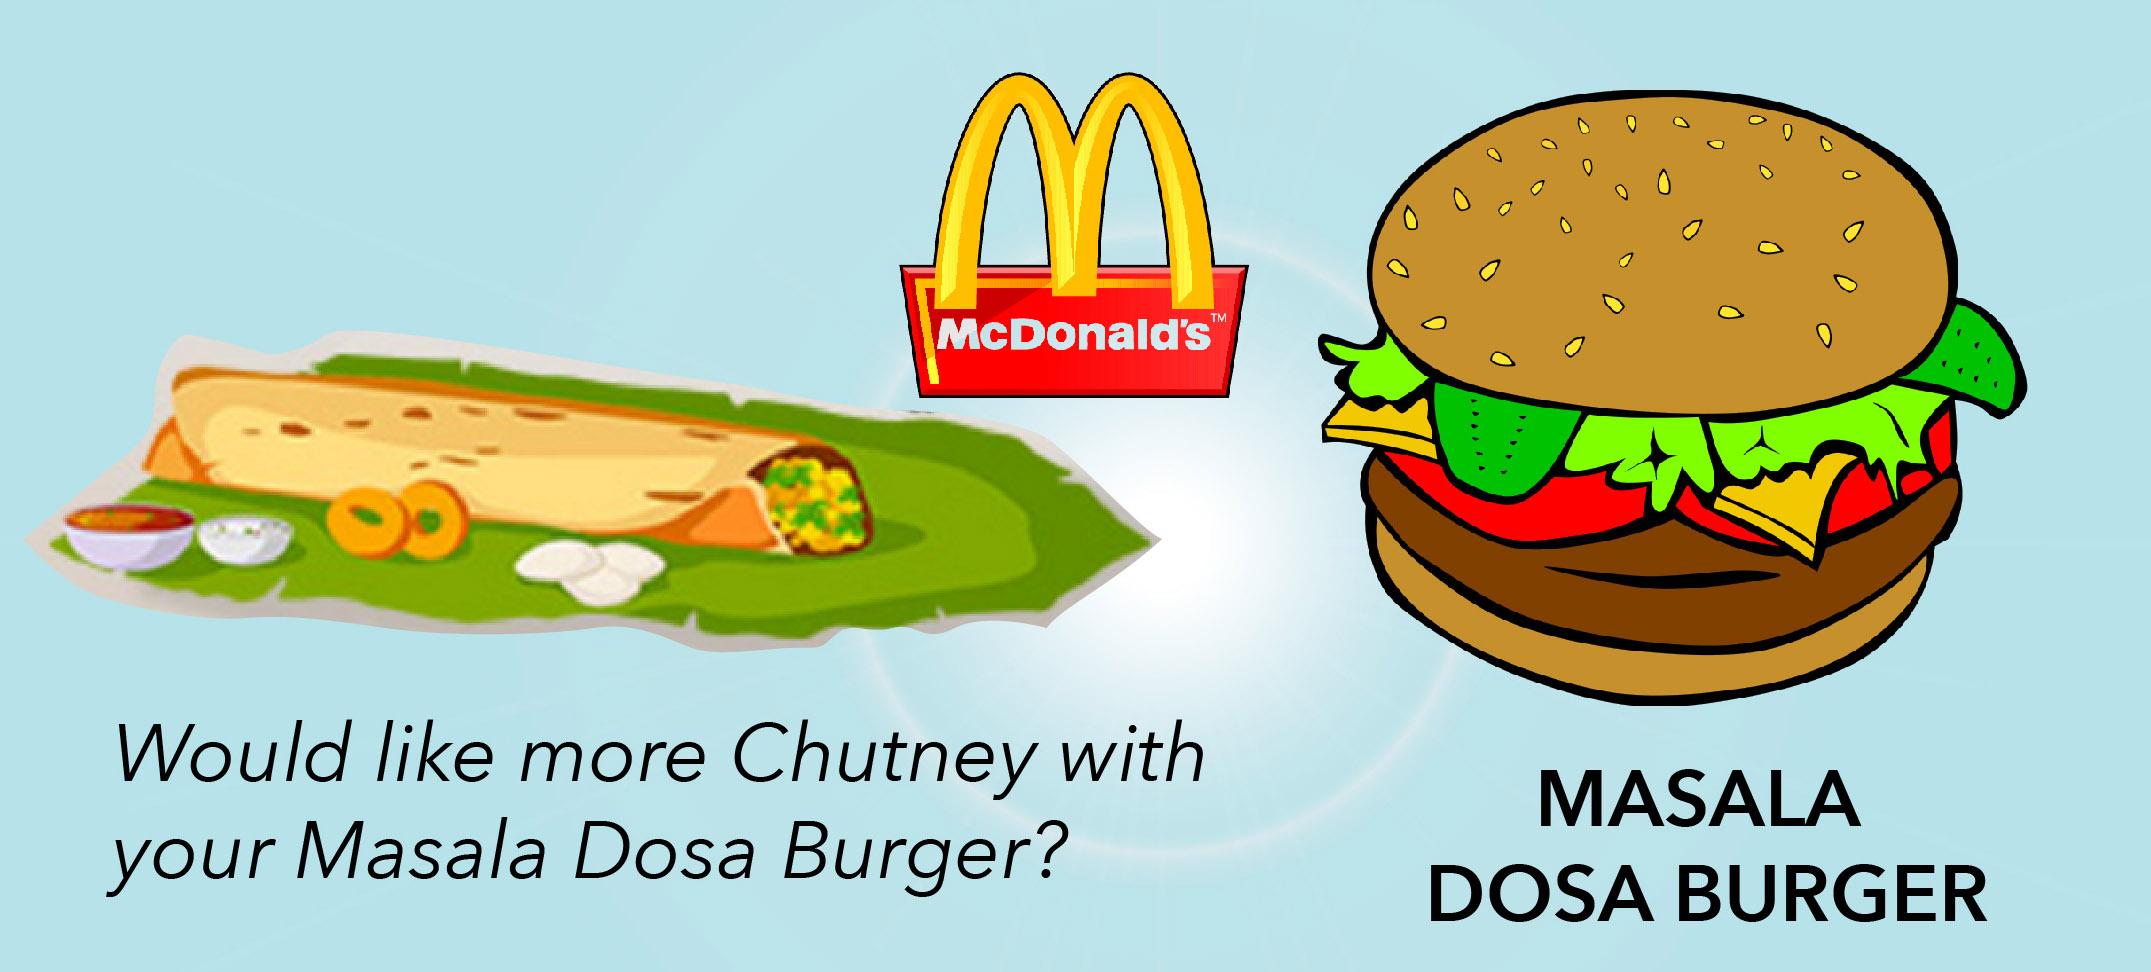 Mc Donalds to launch Masala Dosa burgers and Anda Bhurji